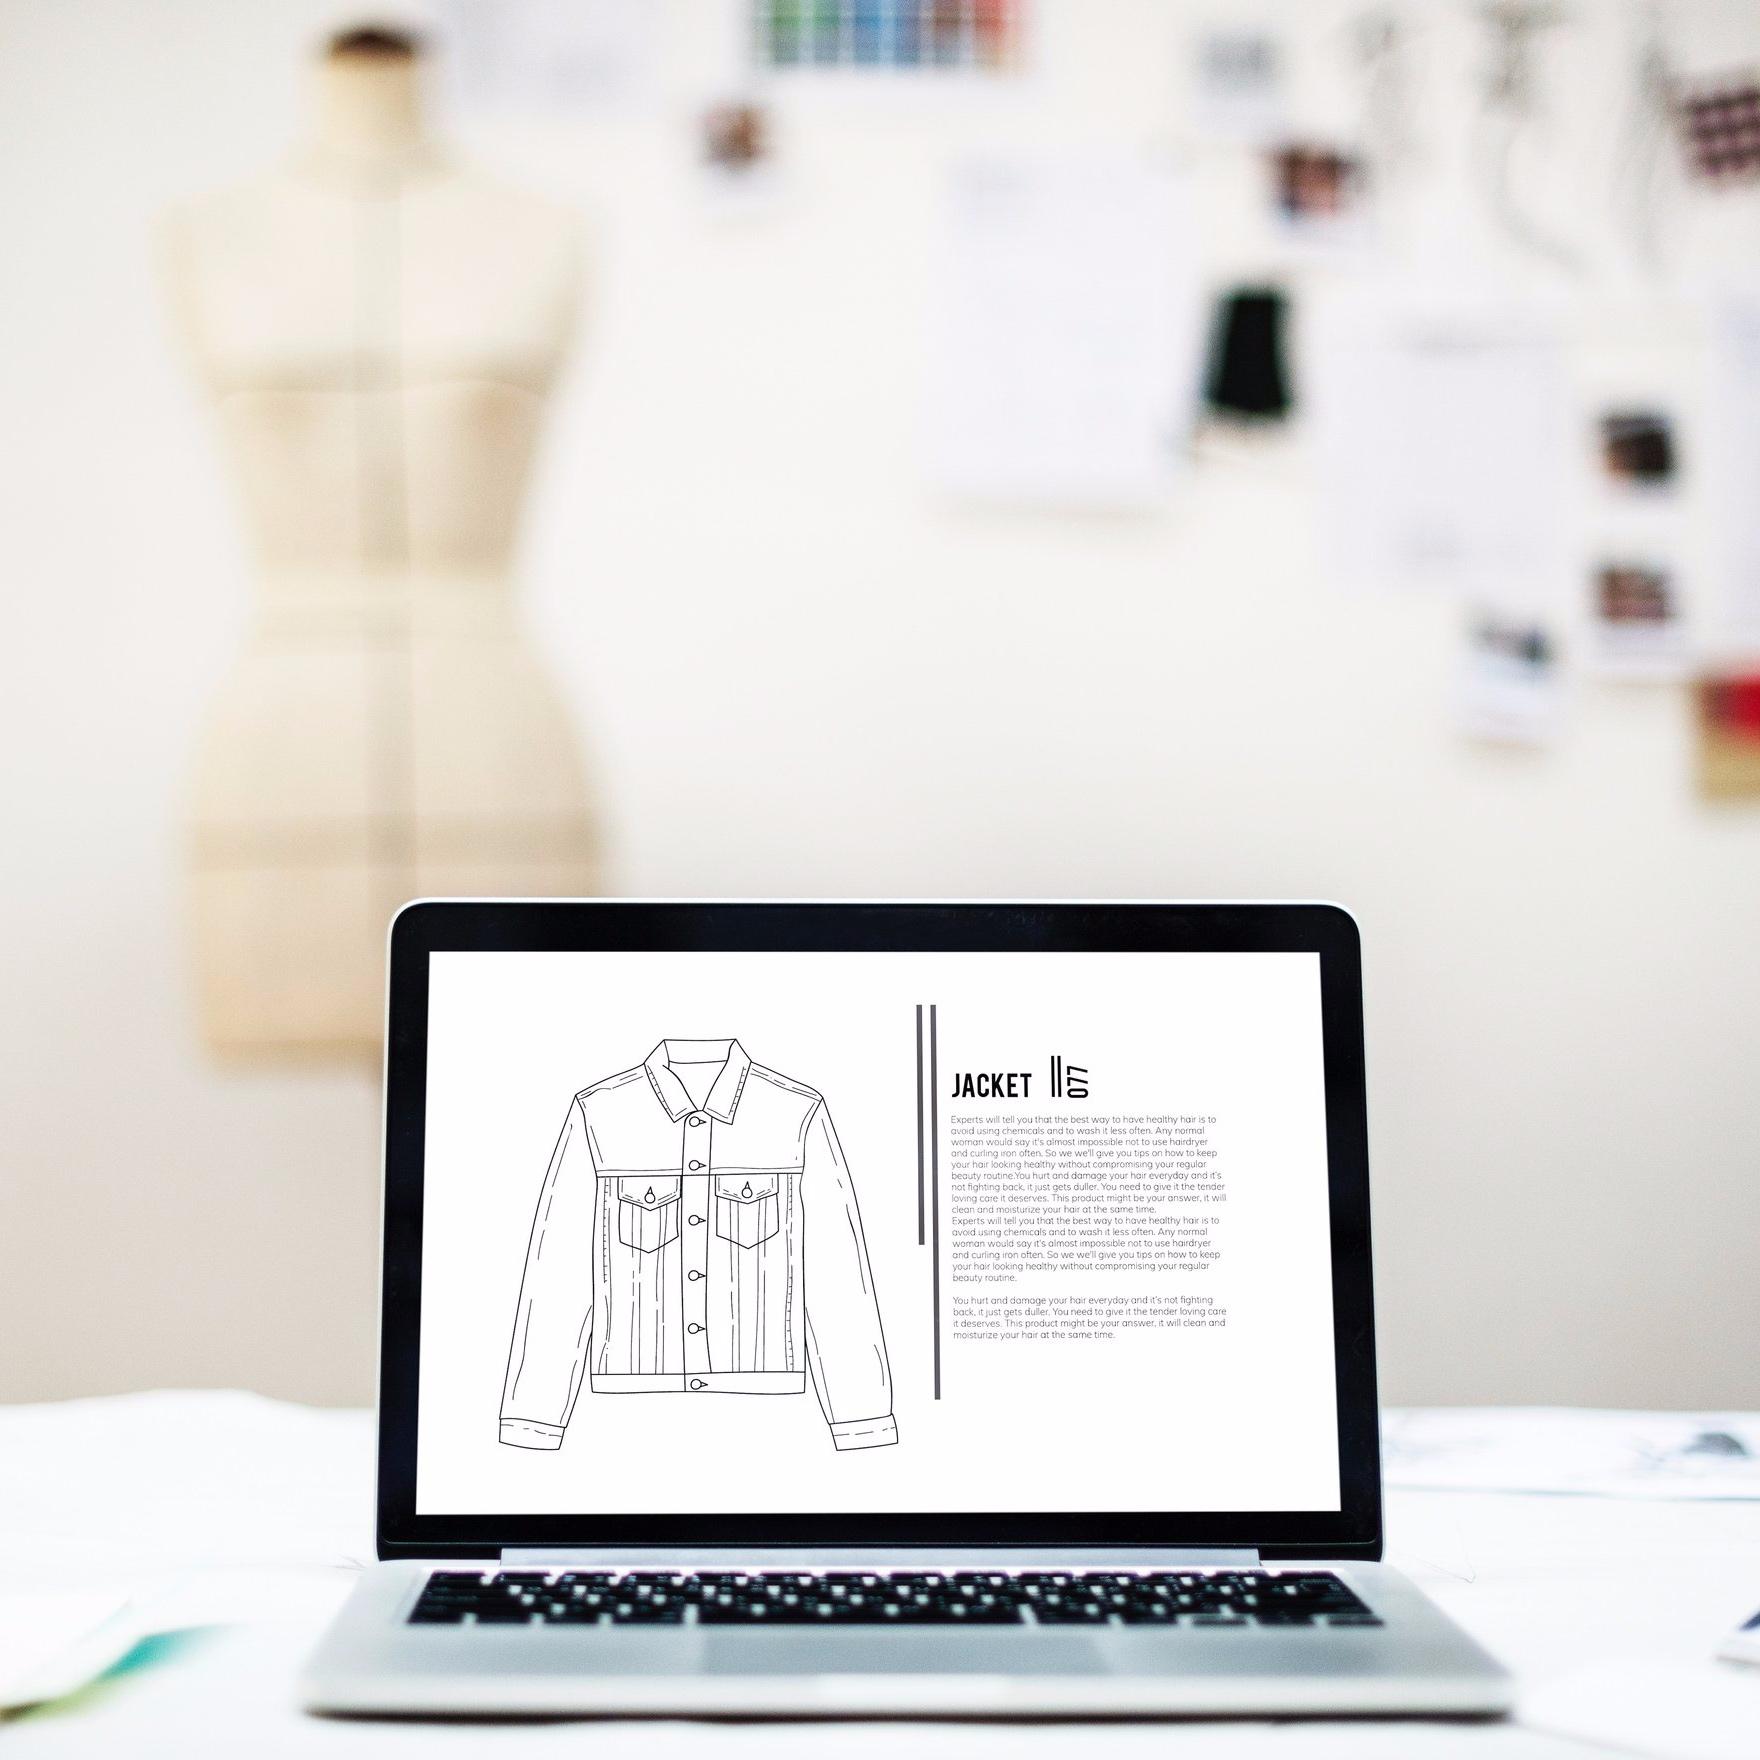 Design Portfolio - An assortment of my professional design work.